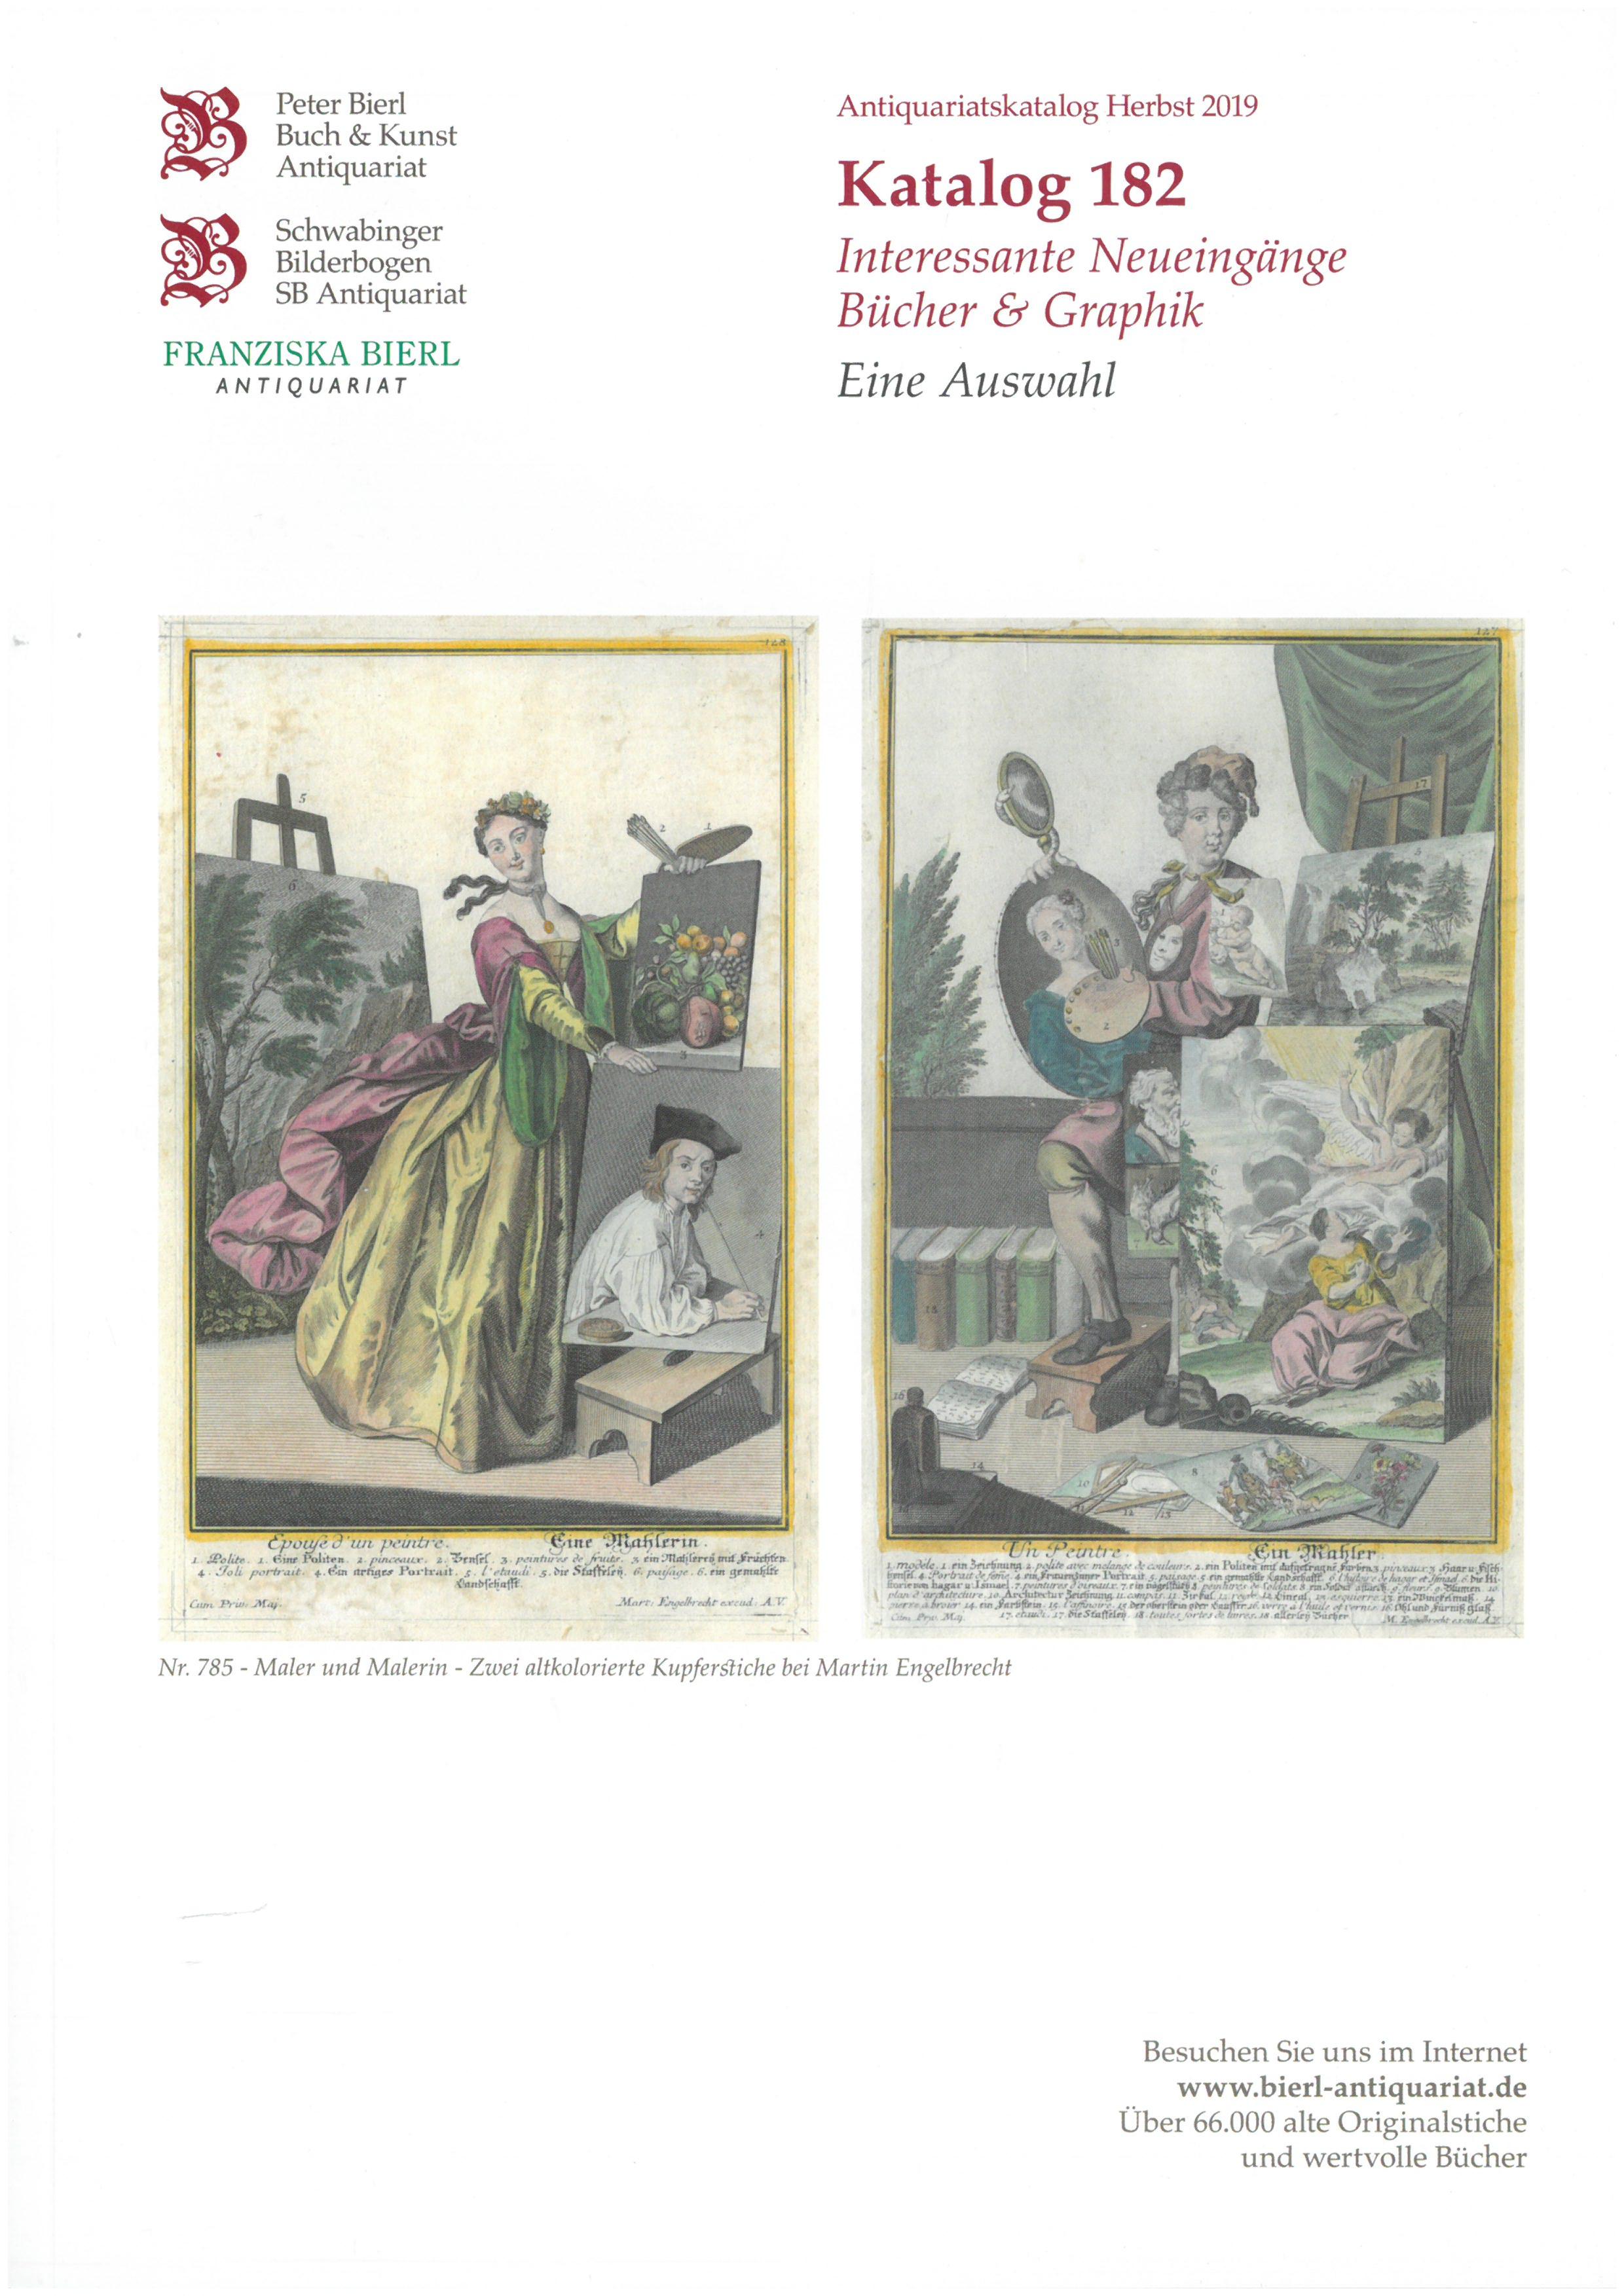 Katalog 182 - Interessante Neueingänge